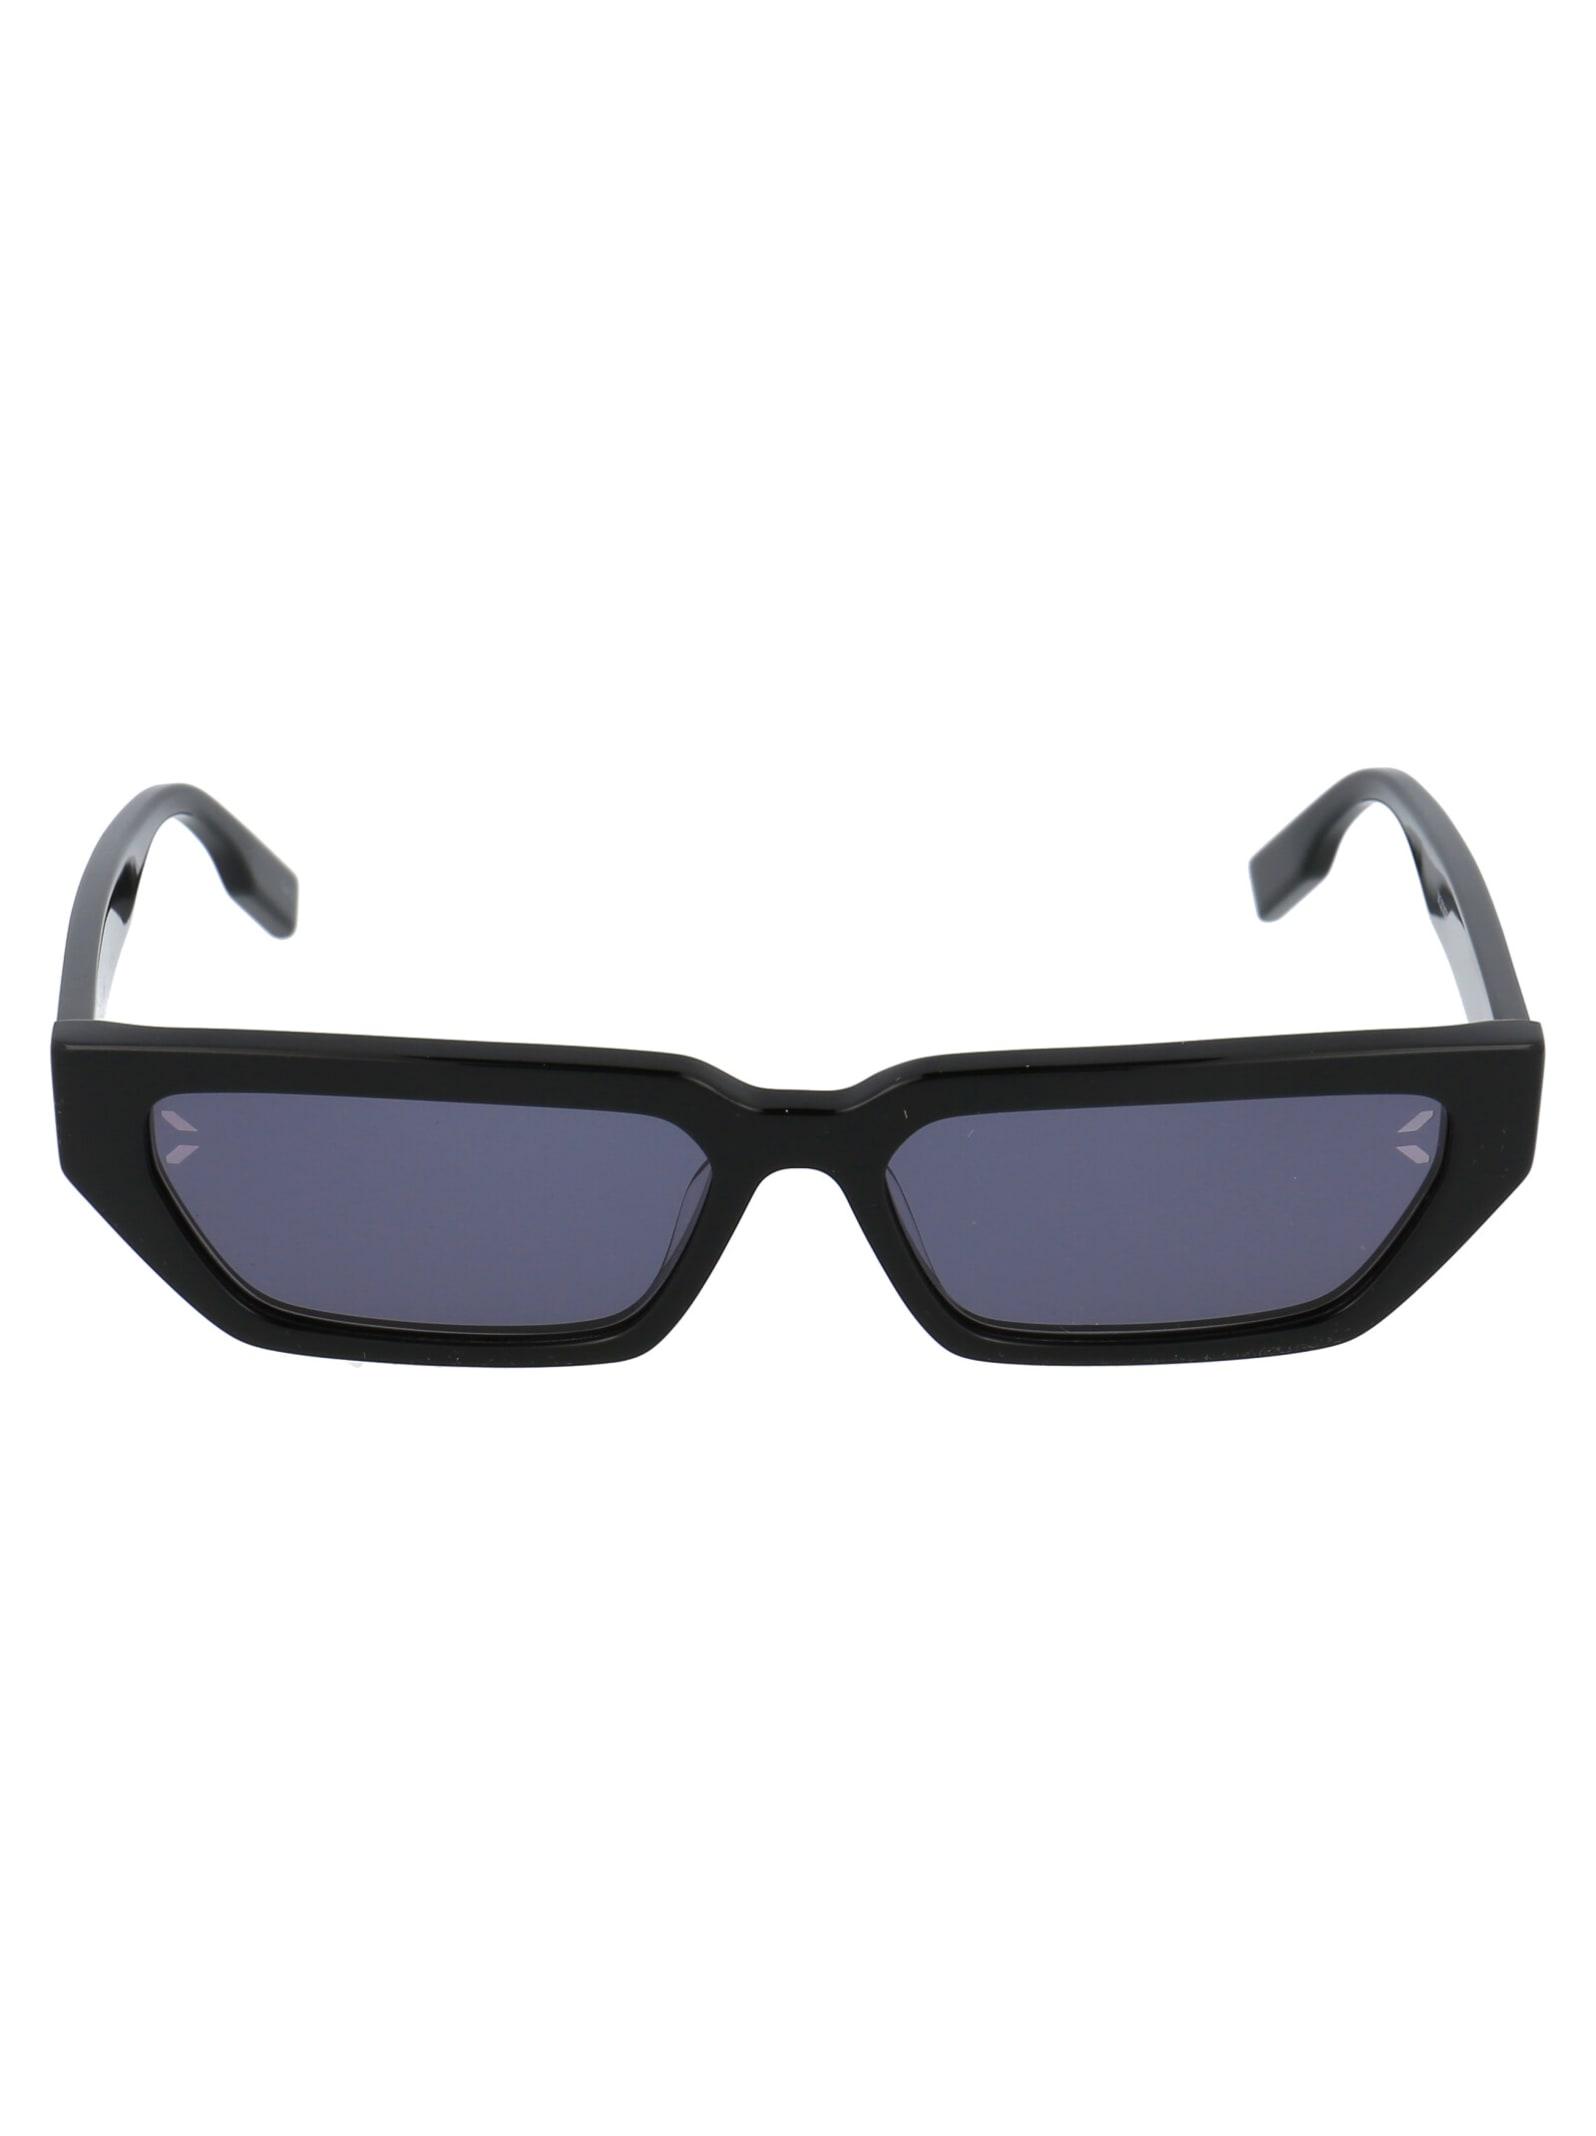 Mq0302s Sunglasses